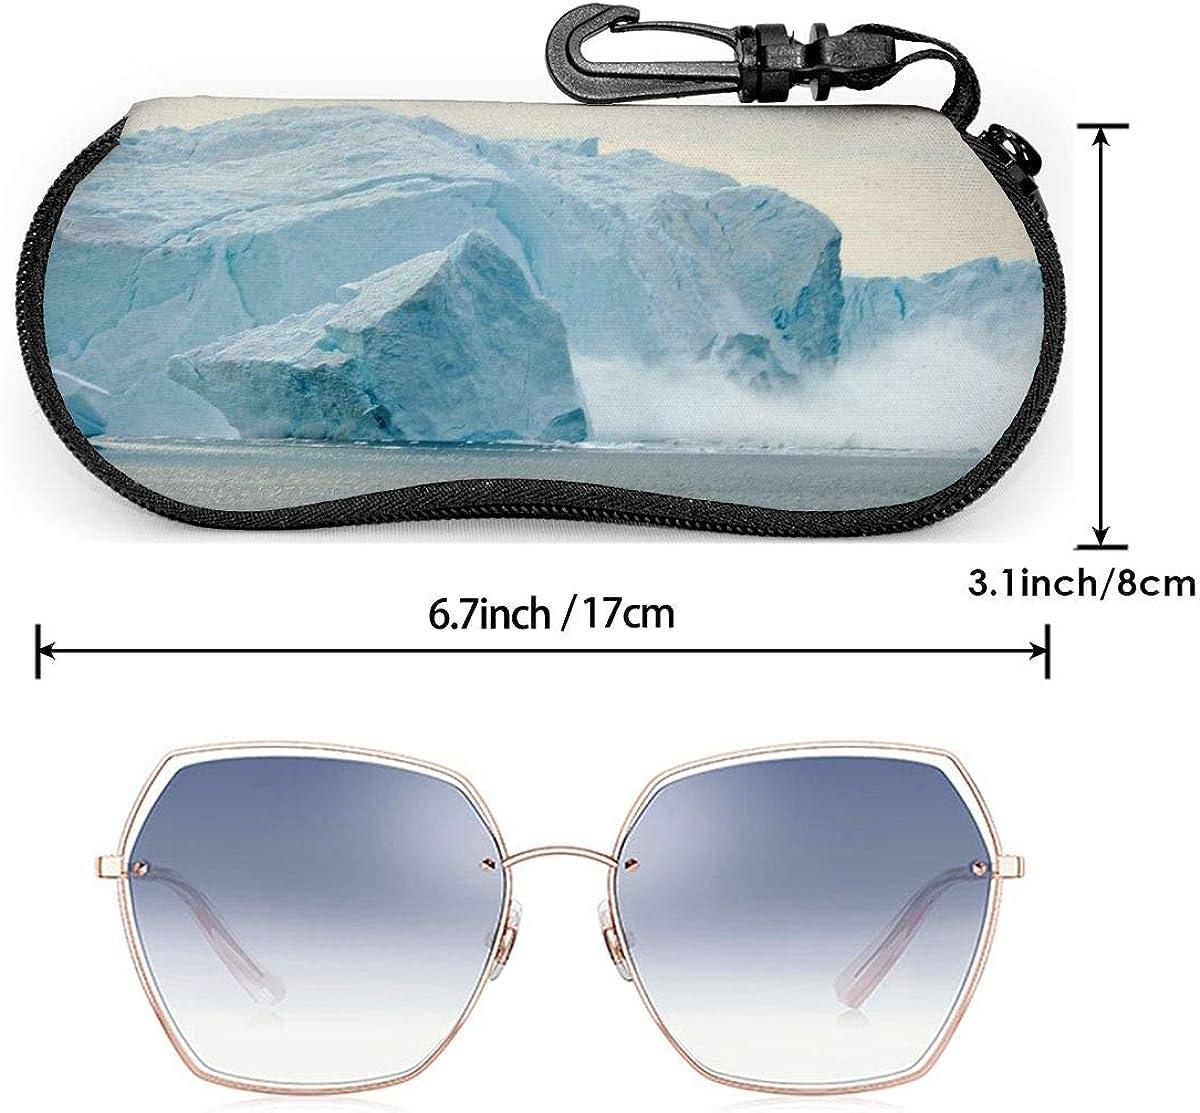 Portable Sunglasses Soft Case Ultra Light Guard Set Snow Eyeglass Case